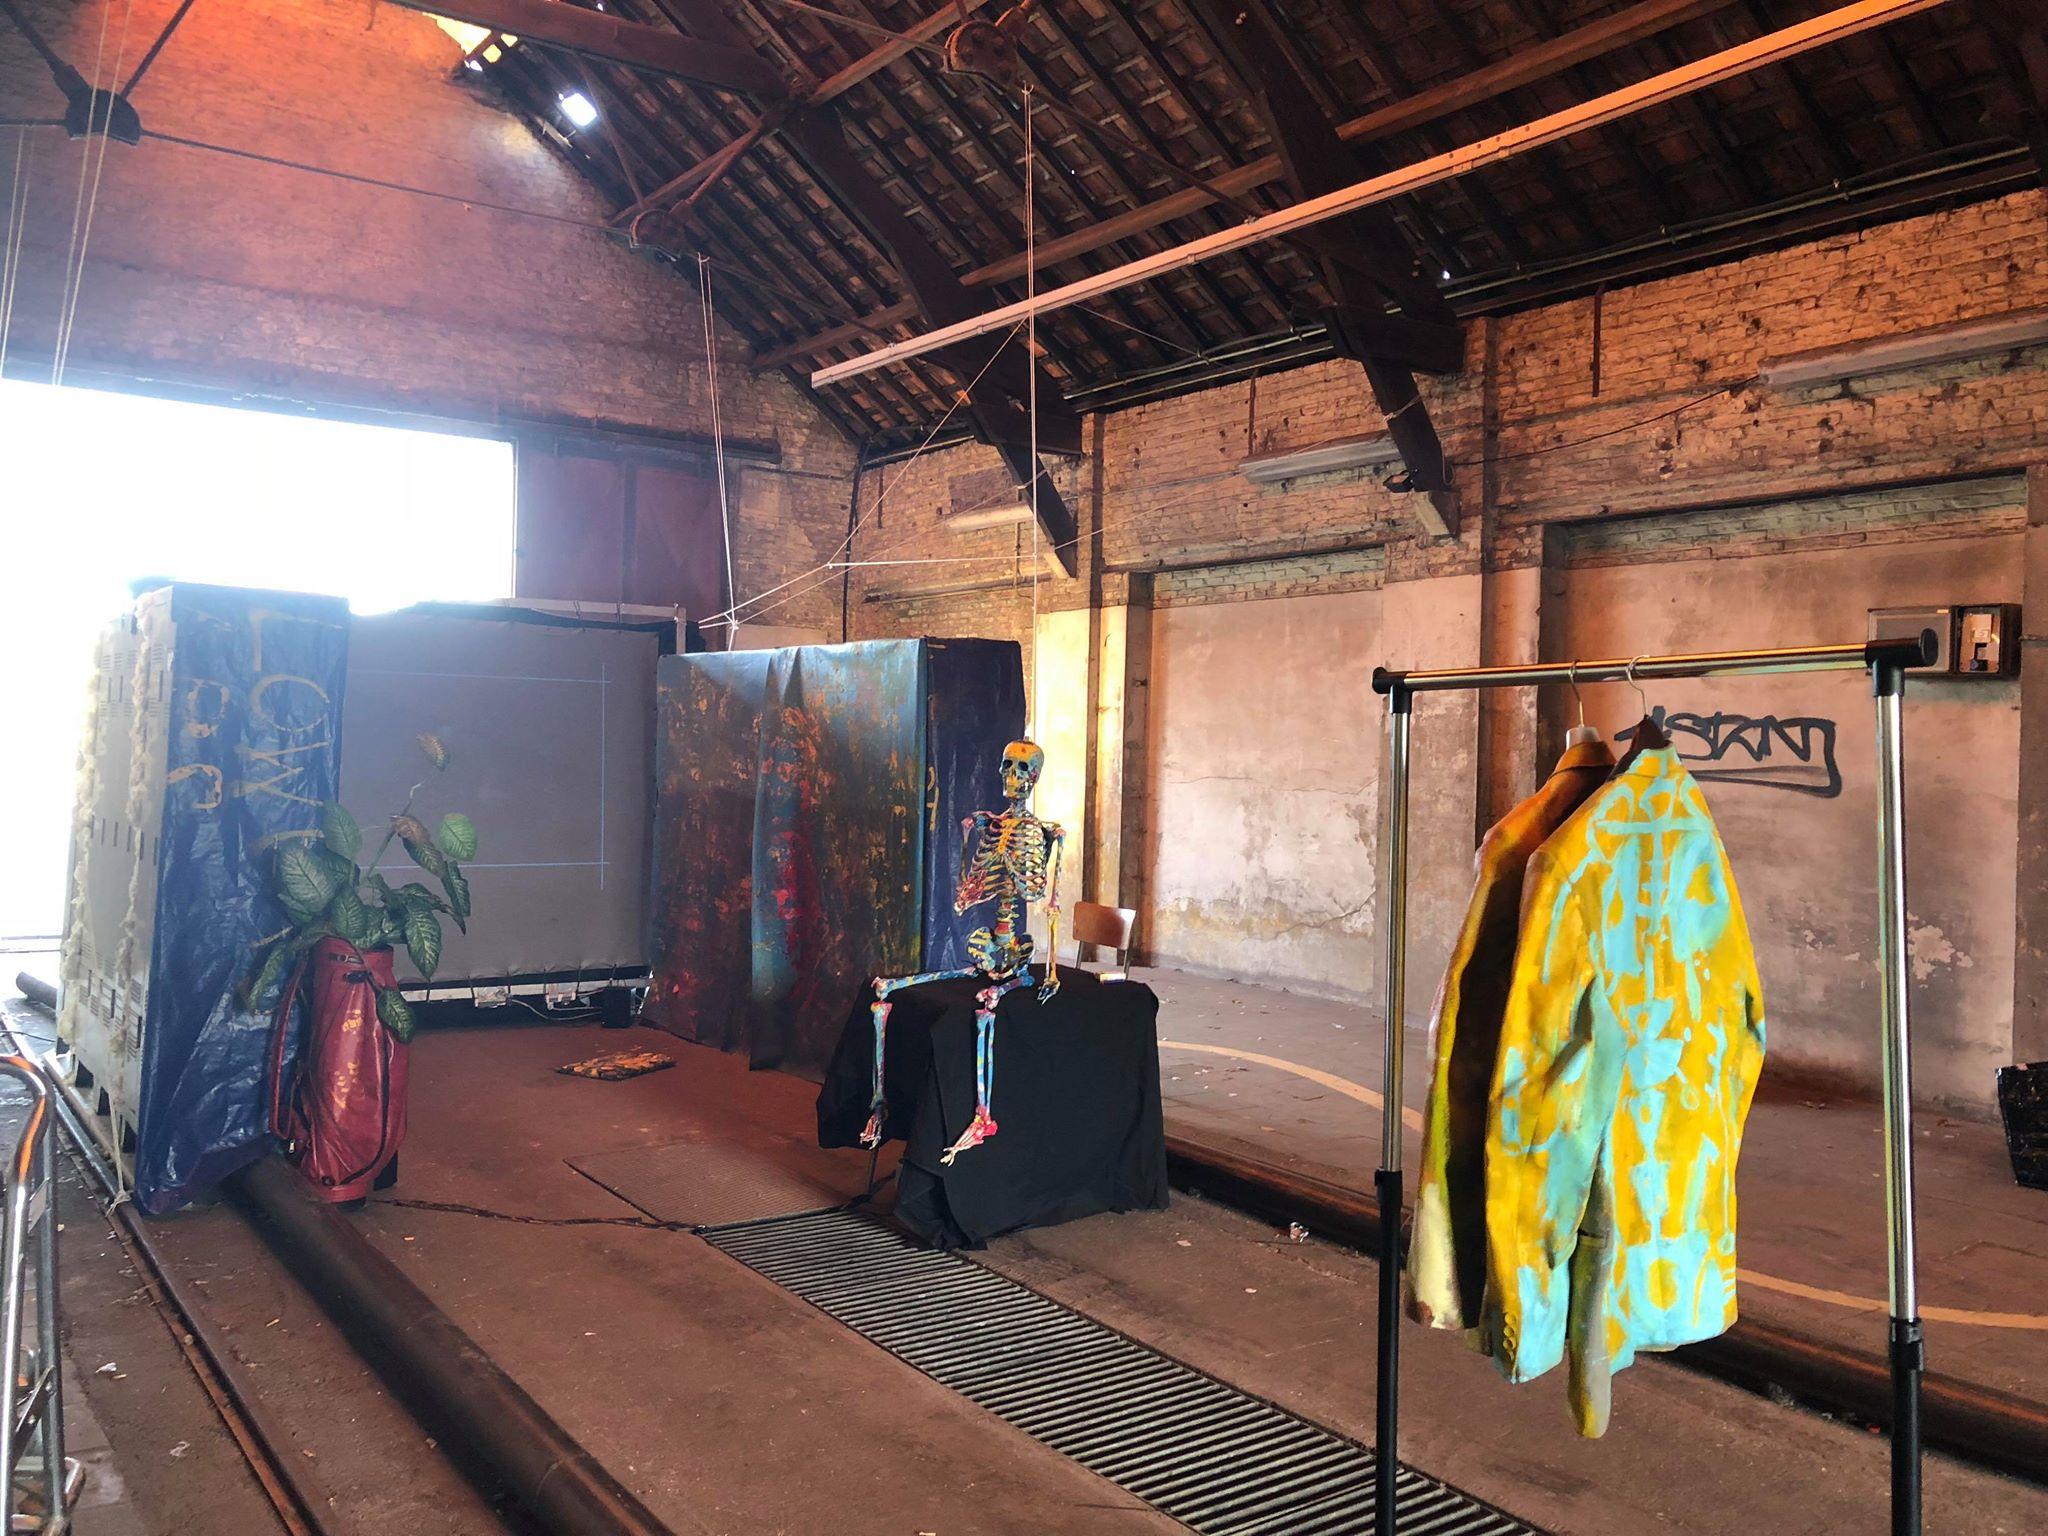 Stelplaats 2018, set up installation at build up